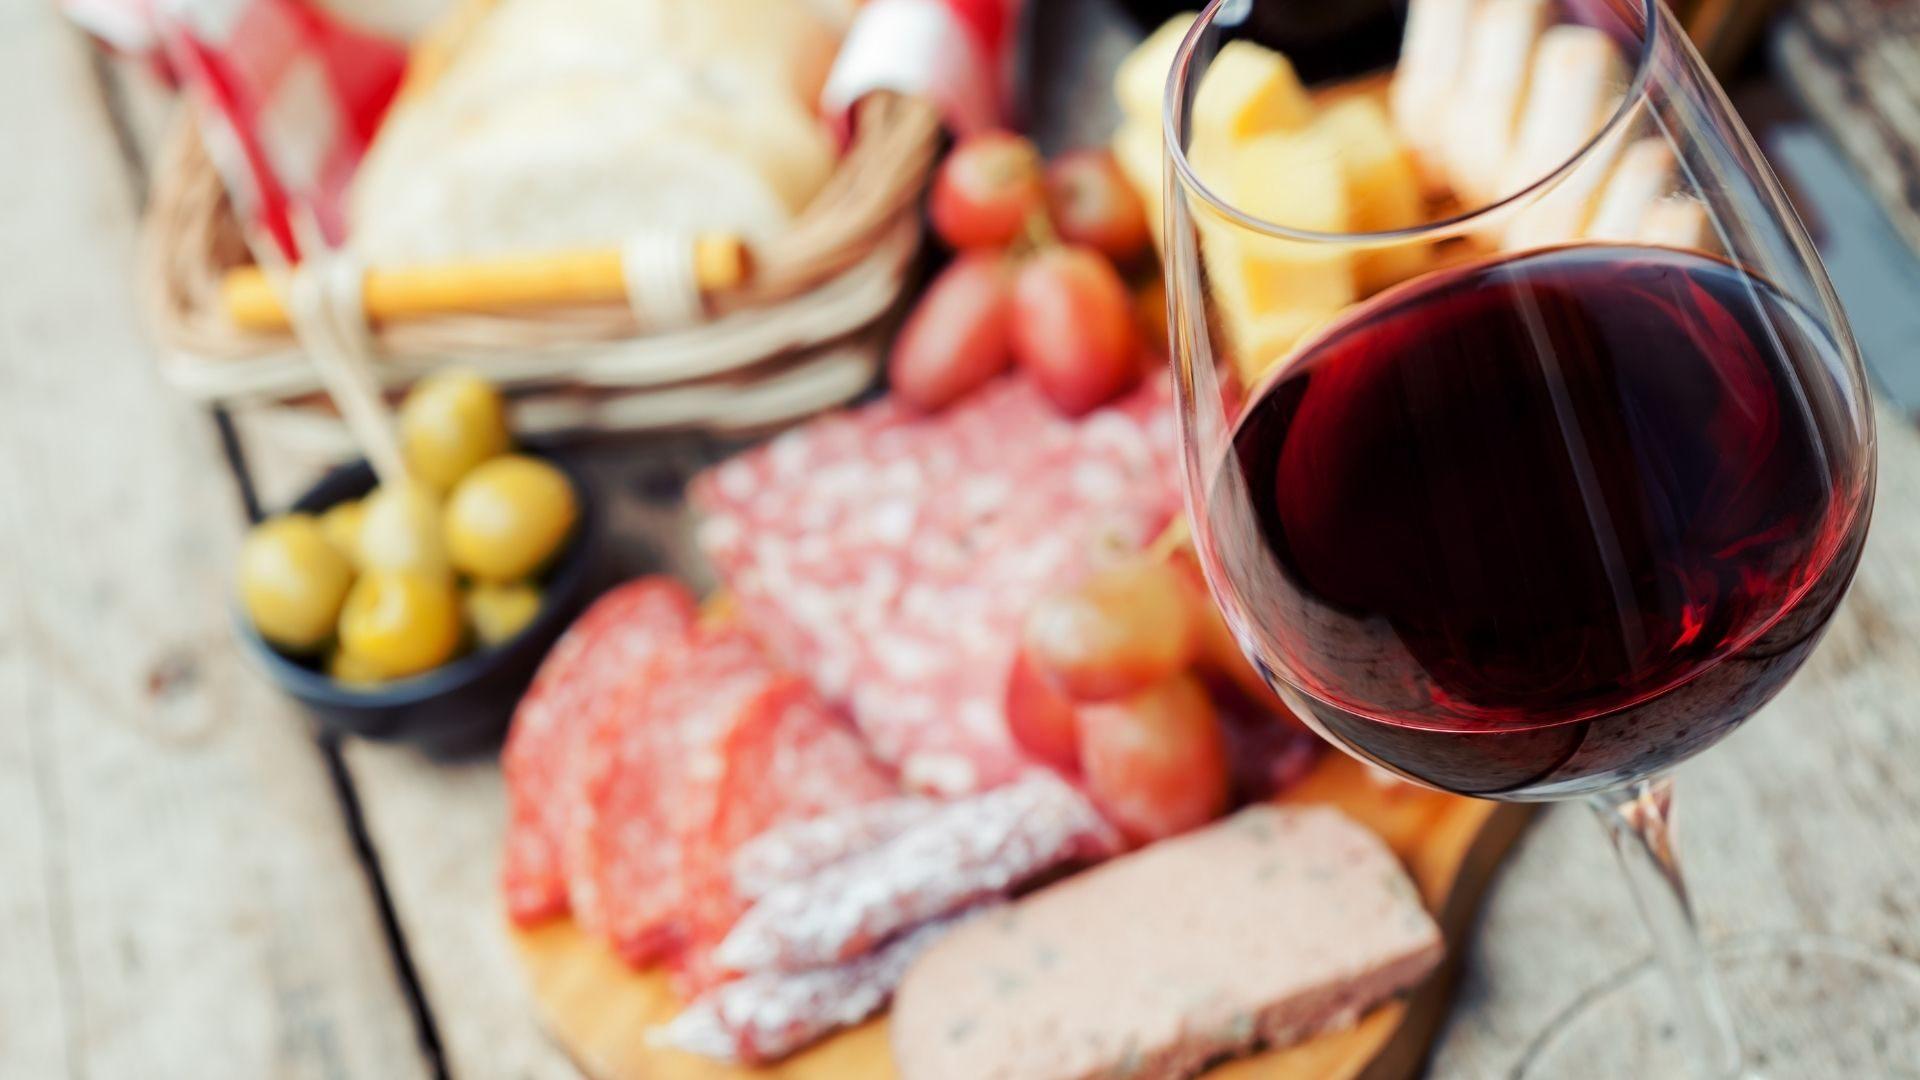 Cos'è il vino novello e perché è differente dal Beaujolais nouveau